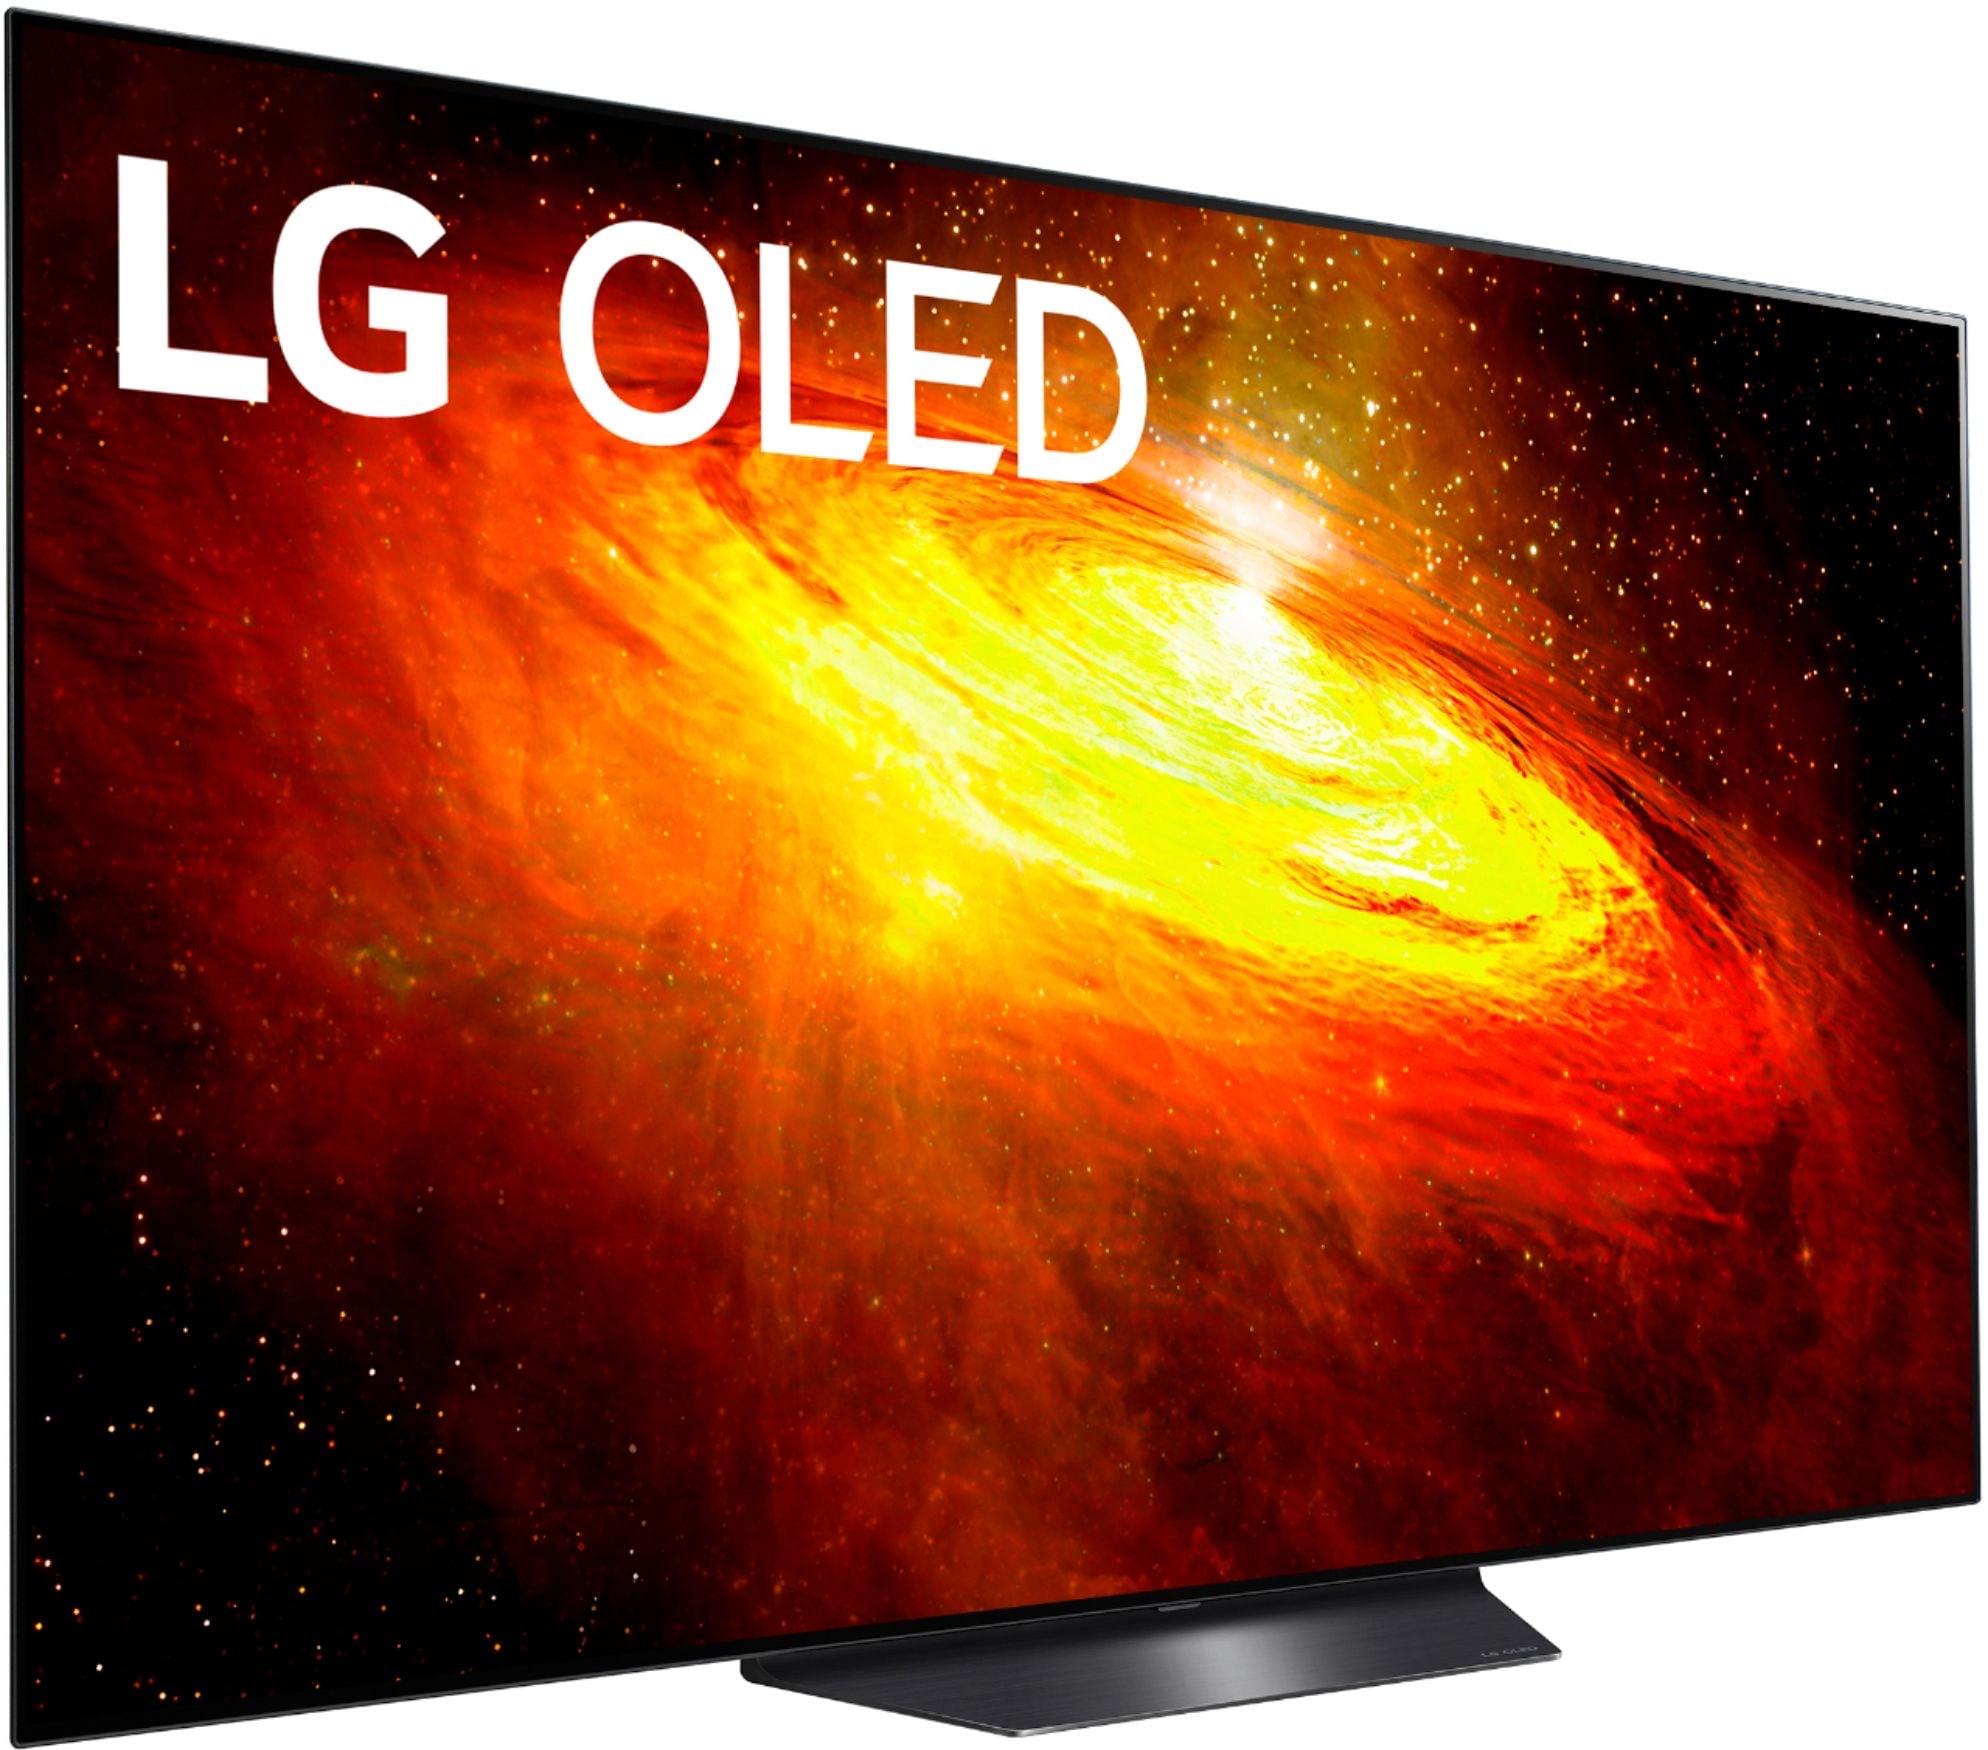 "[CDAV] TV 65"" LG OLED65BX3 - 4K, OLED, Cinéma HDR, Dolby Vision iQ & Dolby Atmos, Dalle 100Hz, HDMI 2.1, FreeSync/G-Sync,Smart TV"